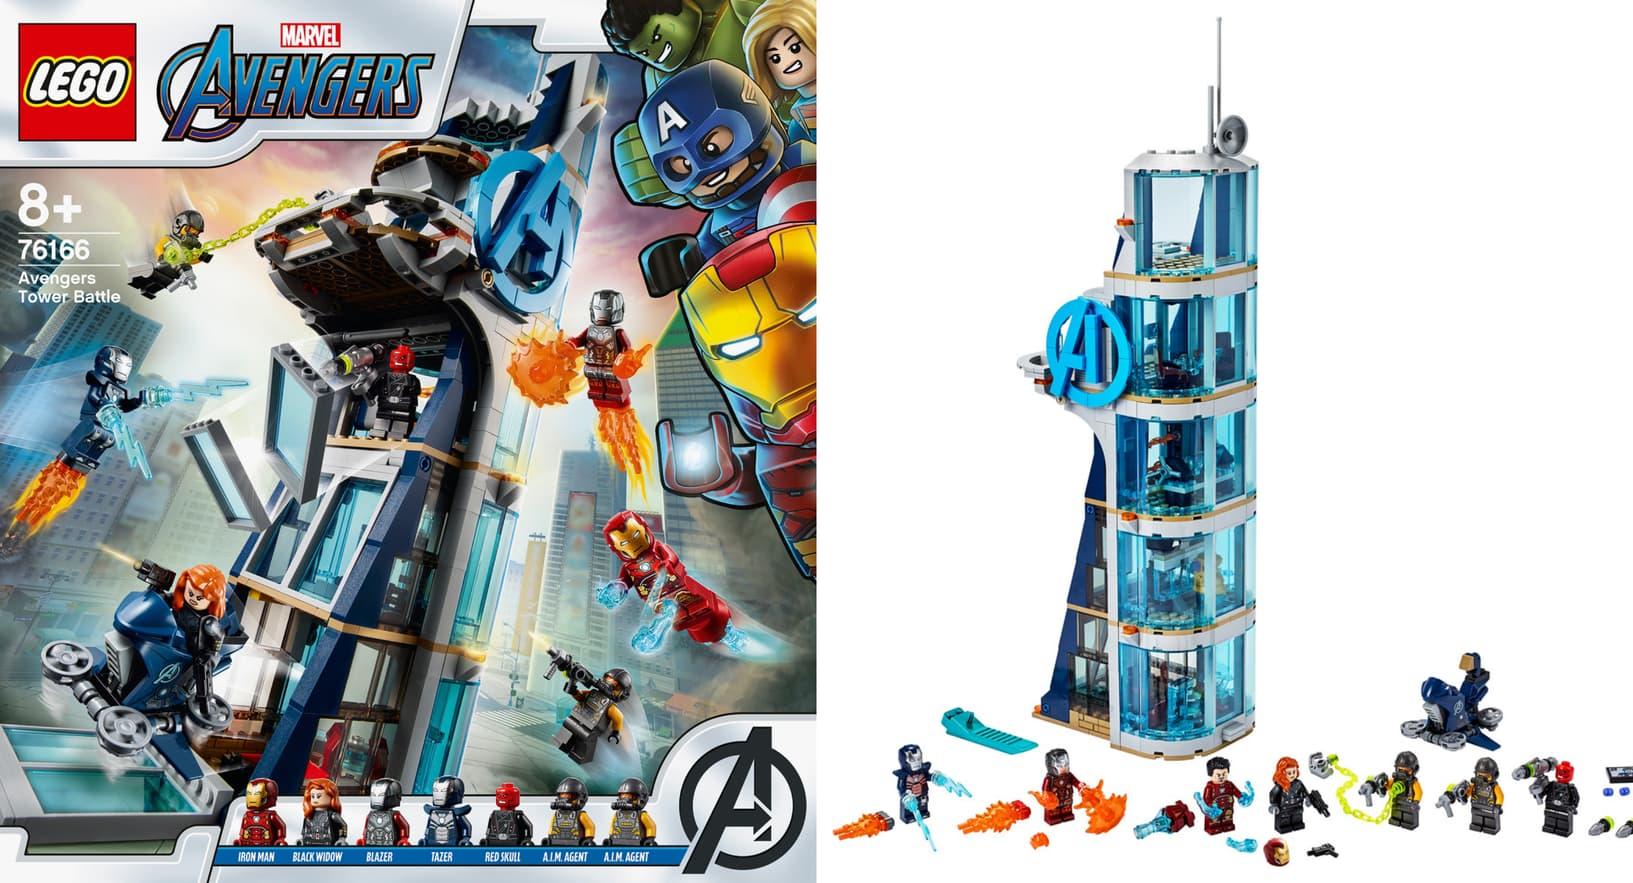 Lego Marvel Avengers Five Brand New Sets Arrive This Summer Marvel